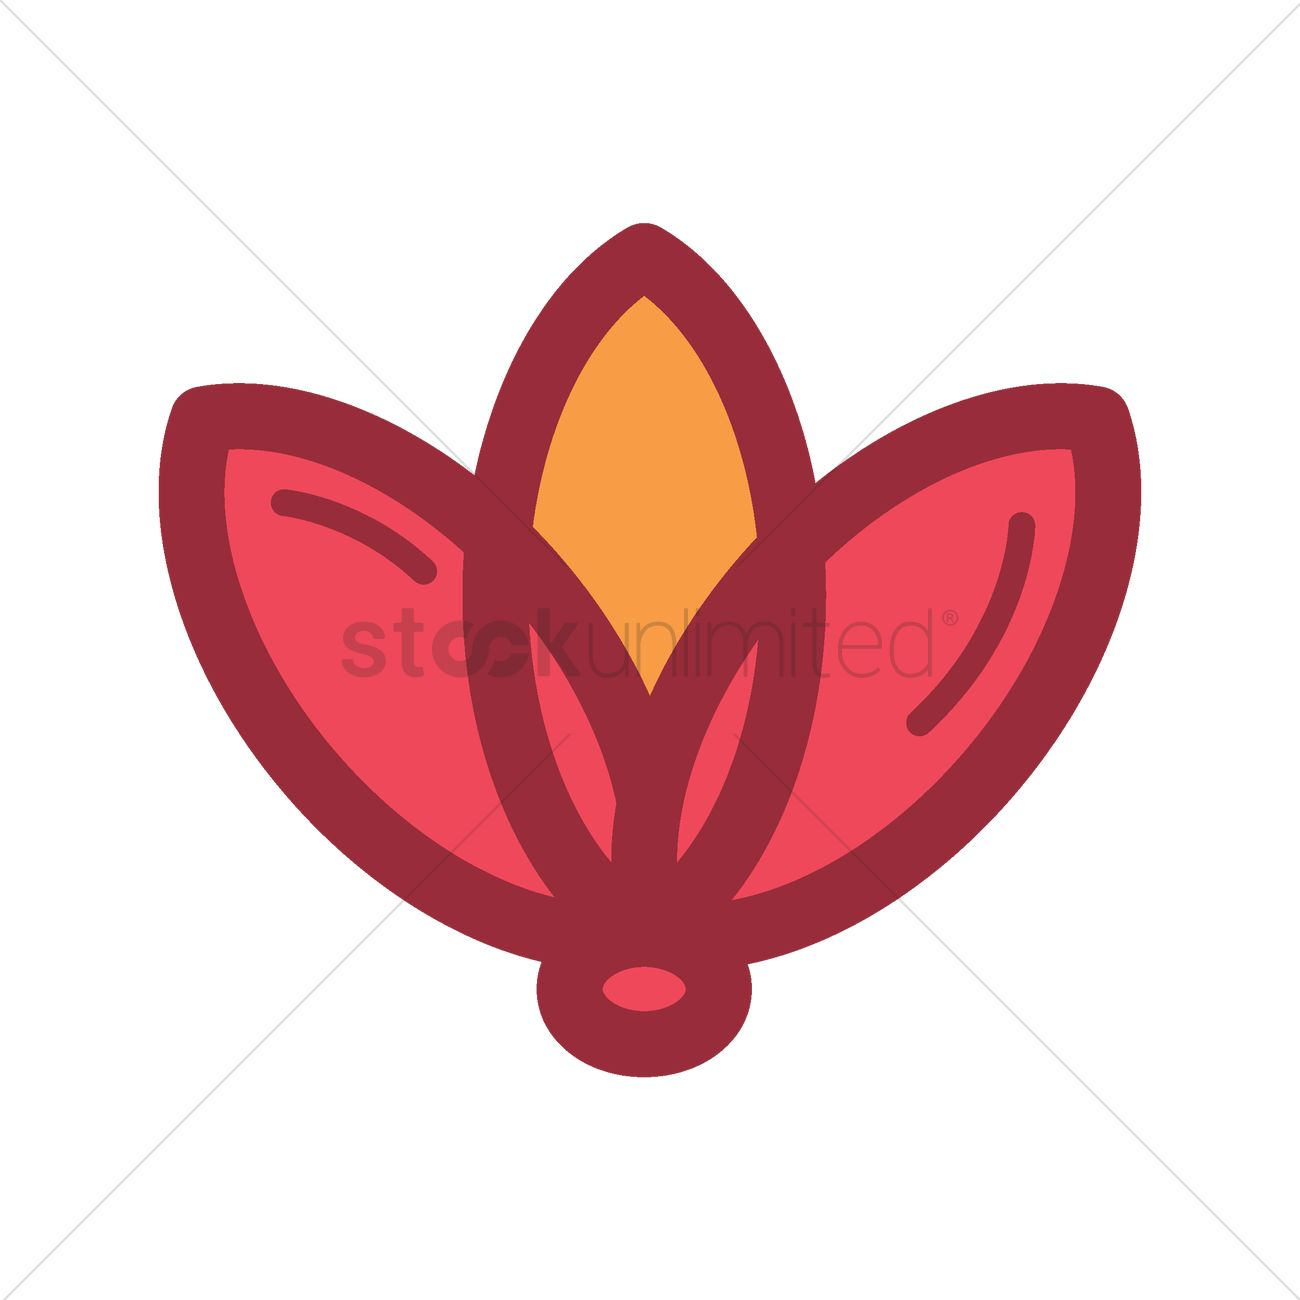 Lotus flower vector image 1967970 stockunlimited lotus flower vector graphic izmirmasajfo